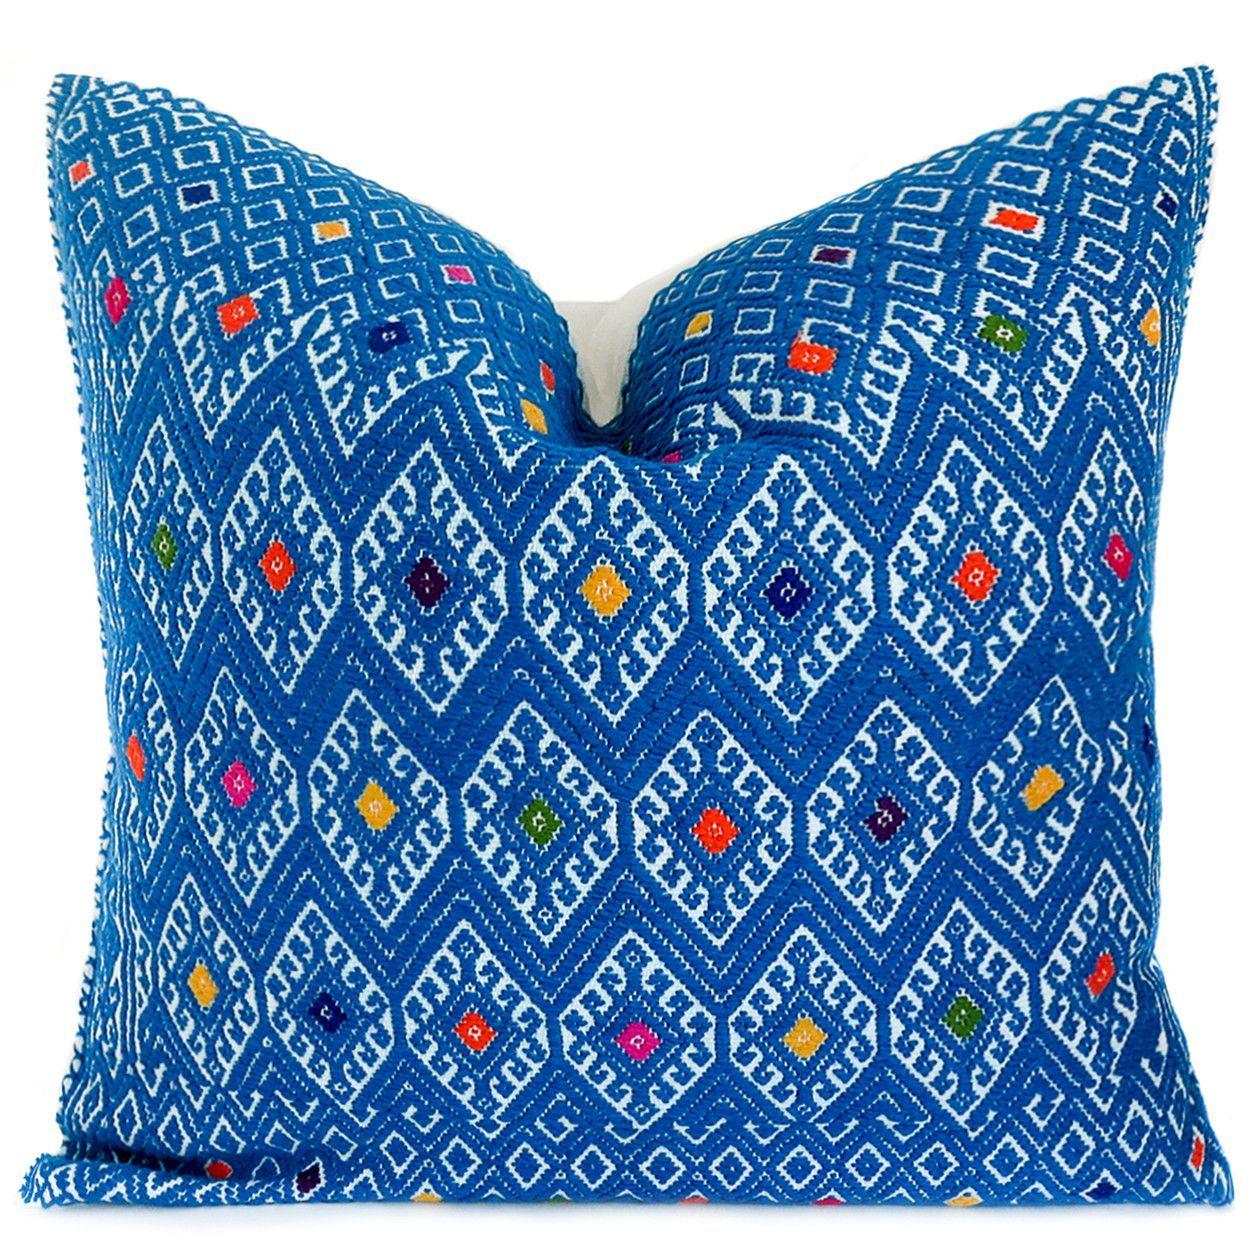 Yucatán chiapas pillow products